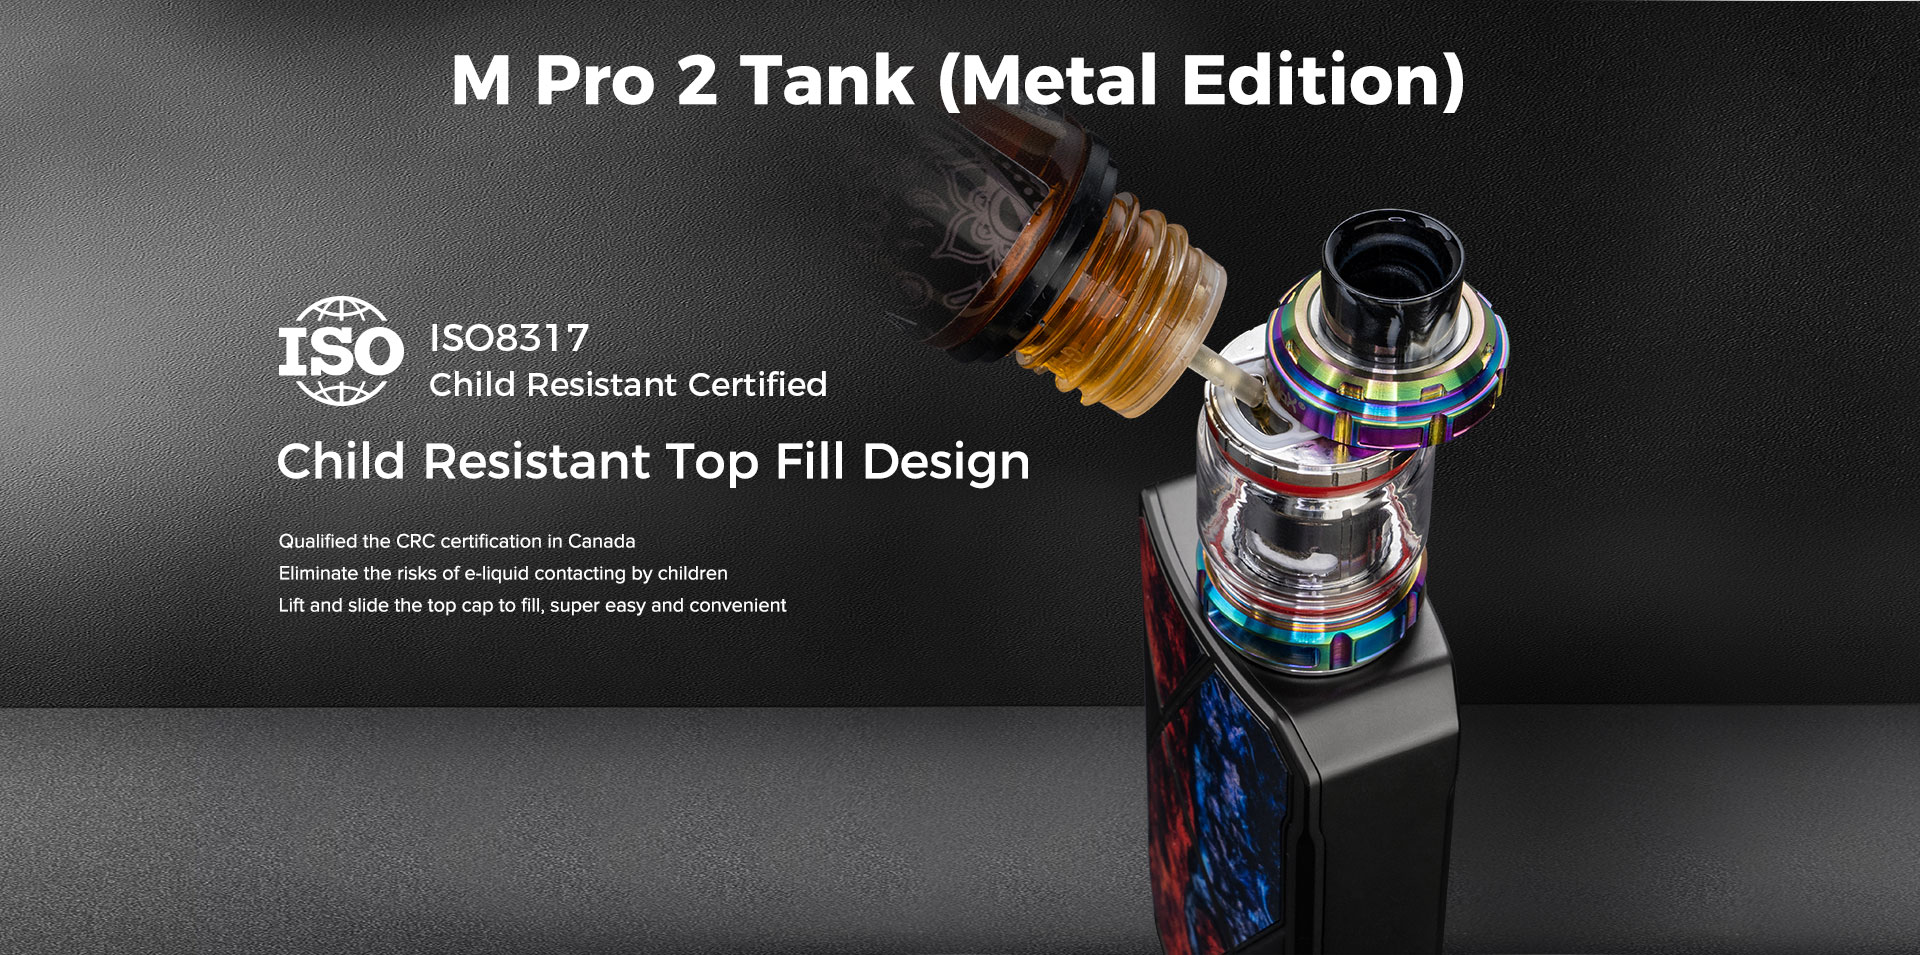 Maxus 200W Kit Metal Edition-4.jpg